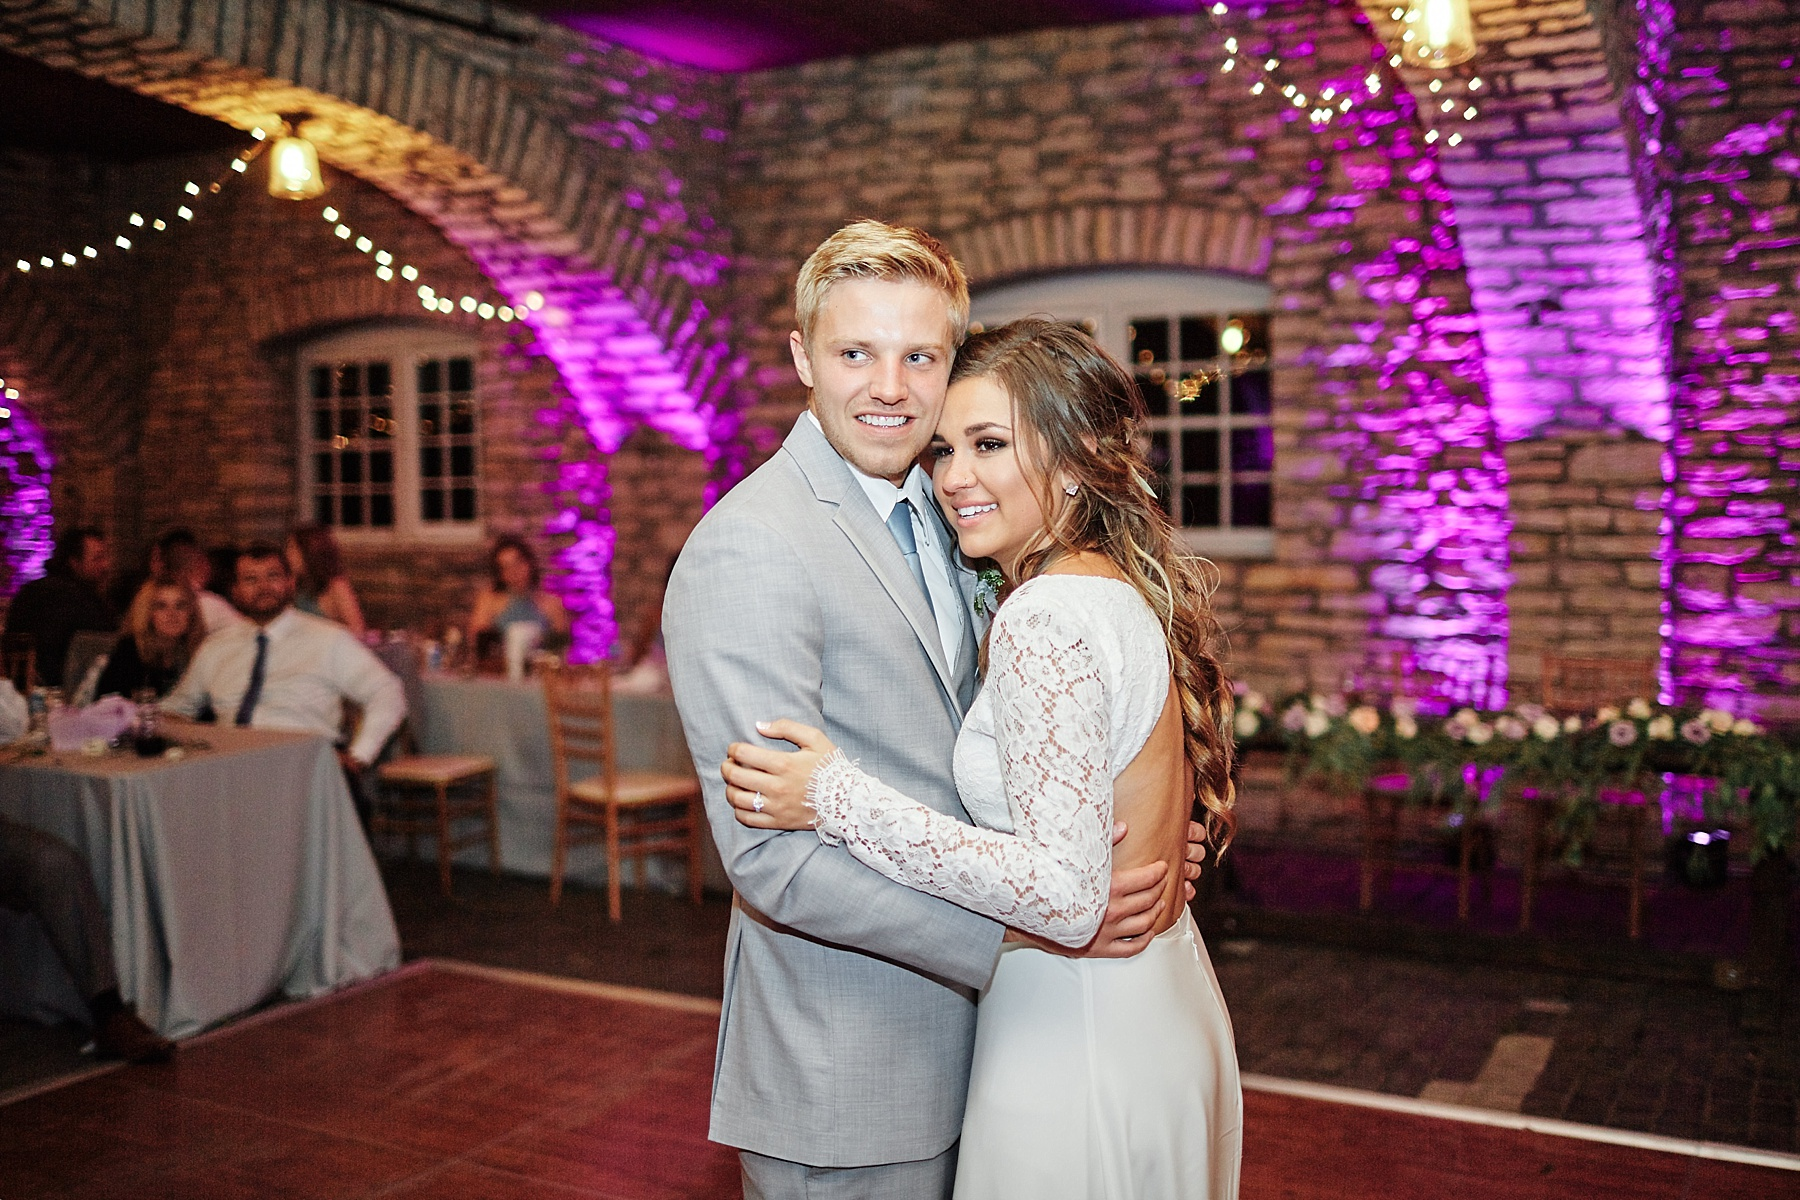 Maywood-Stone-Barn-Wedding-Rochester-Minnesota-Perry-James-Photo_0693.jpg